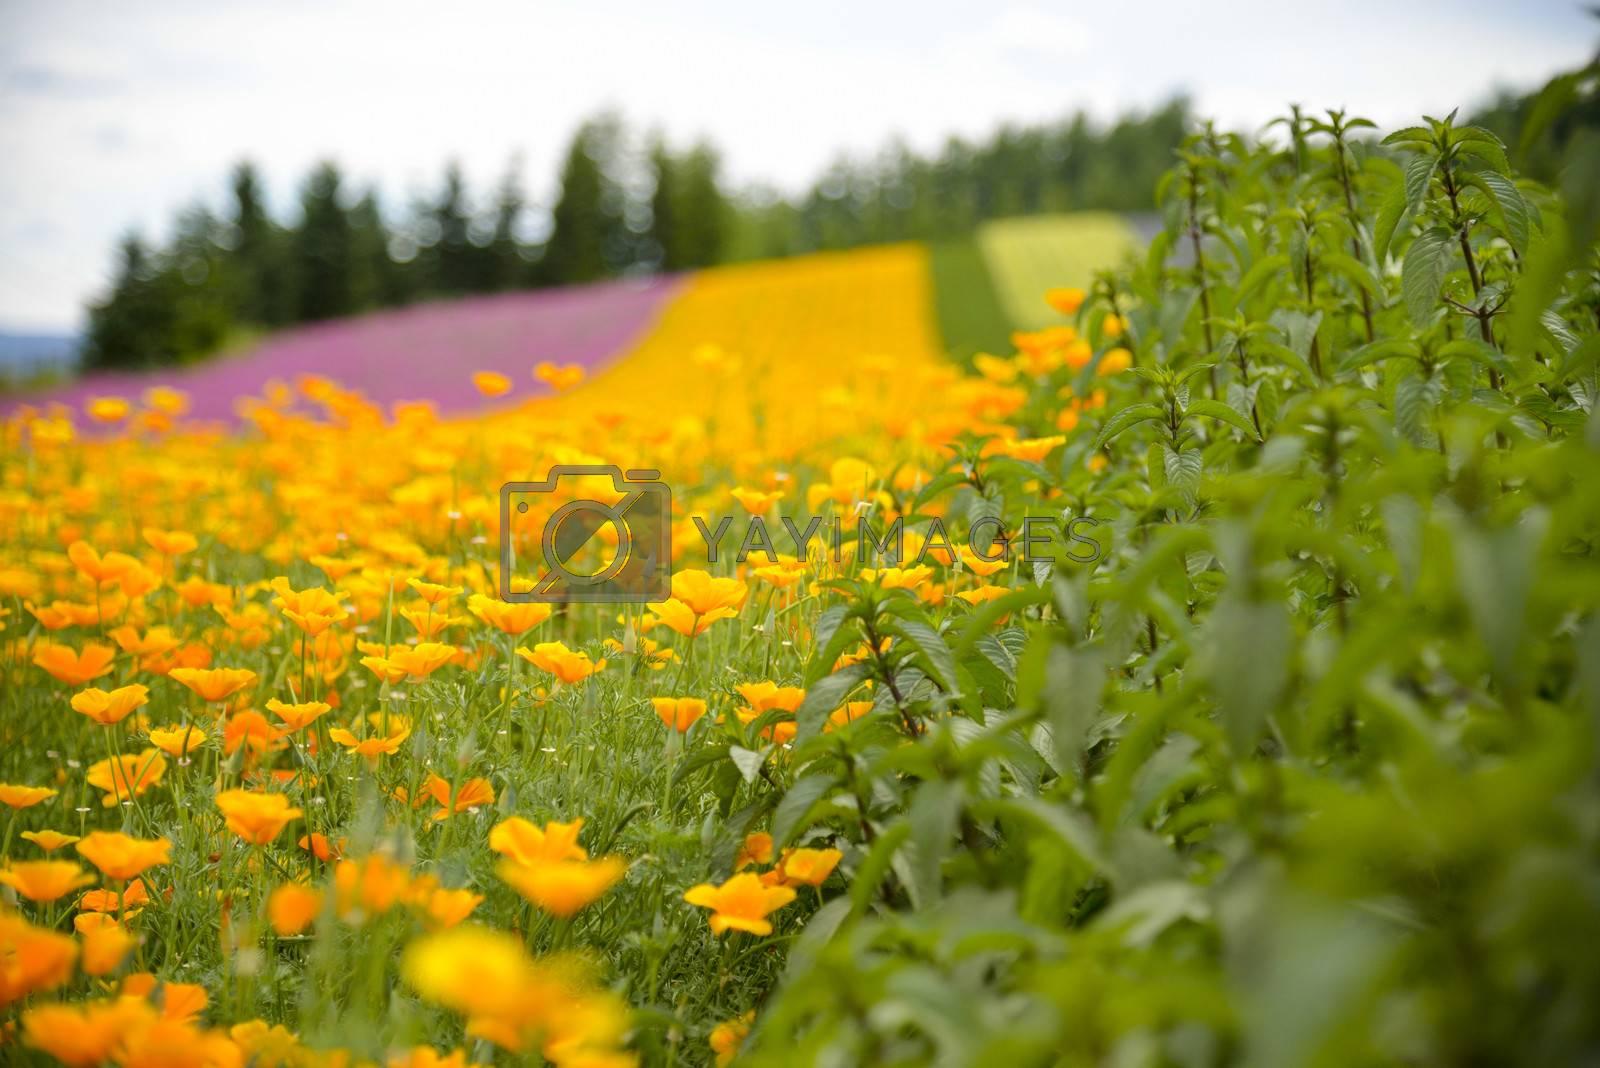 Herb and colurful flower garden4 by gjeerawut